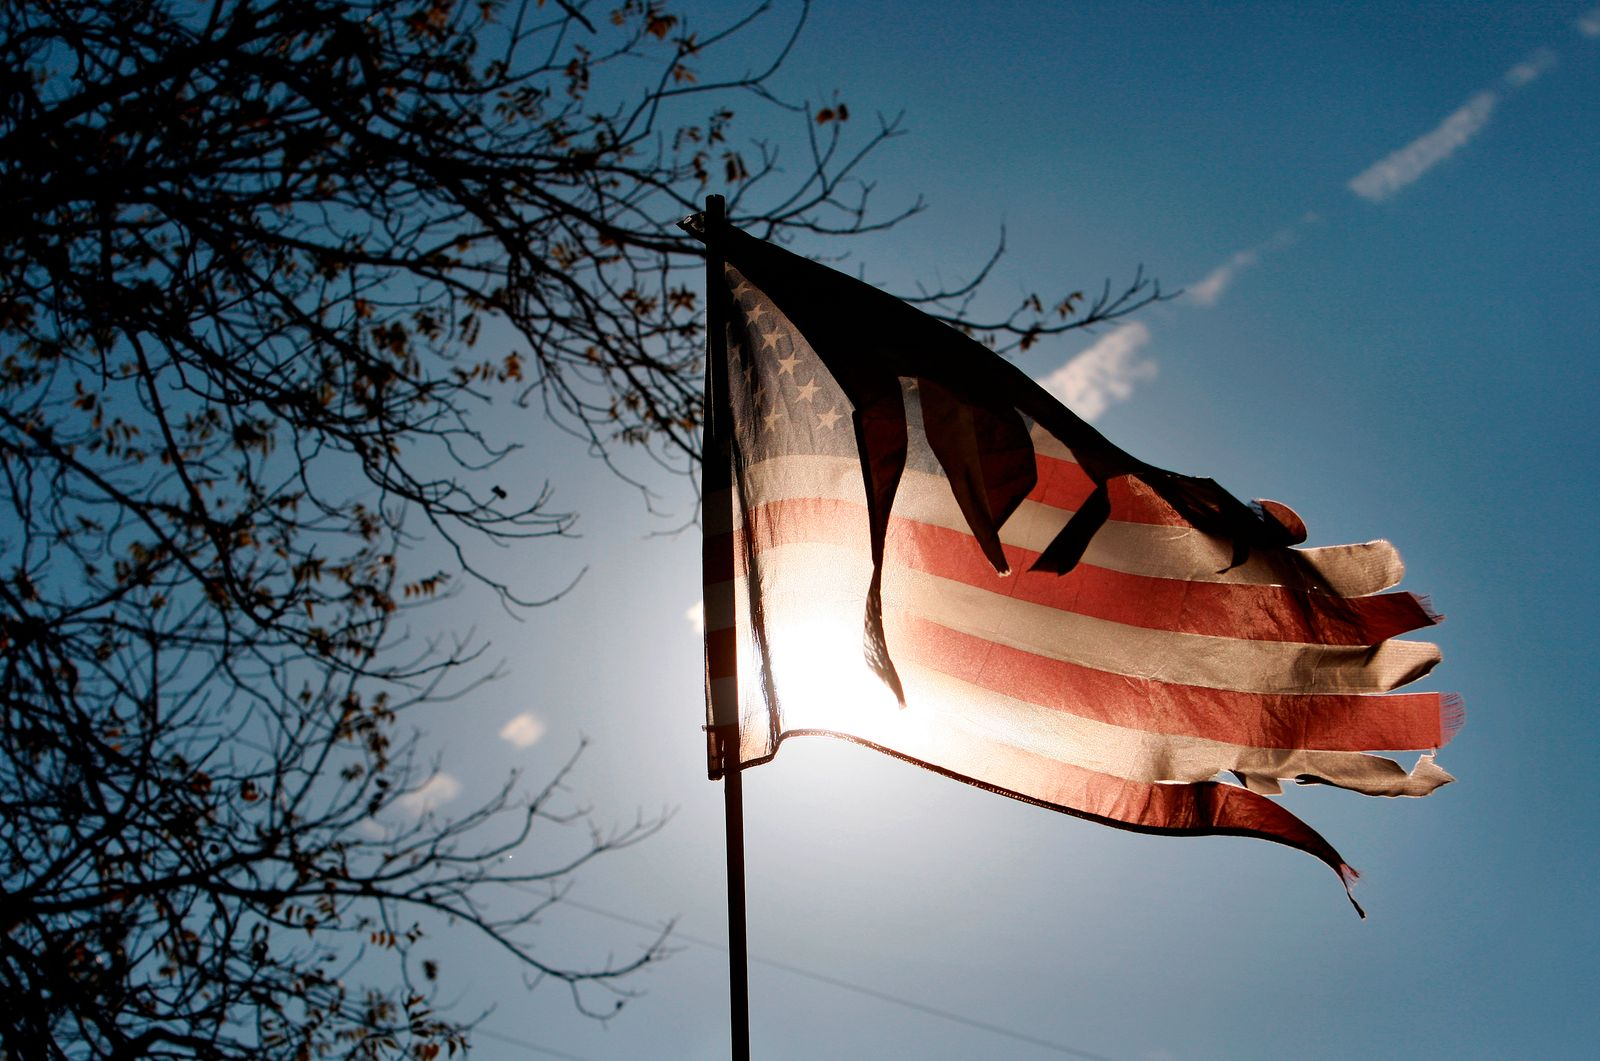 USA / Fahne / zerrissen / Armut / Konjunktur